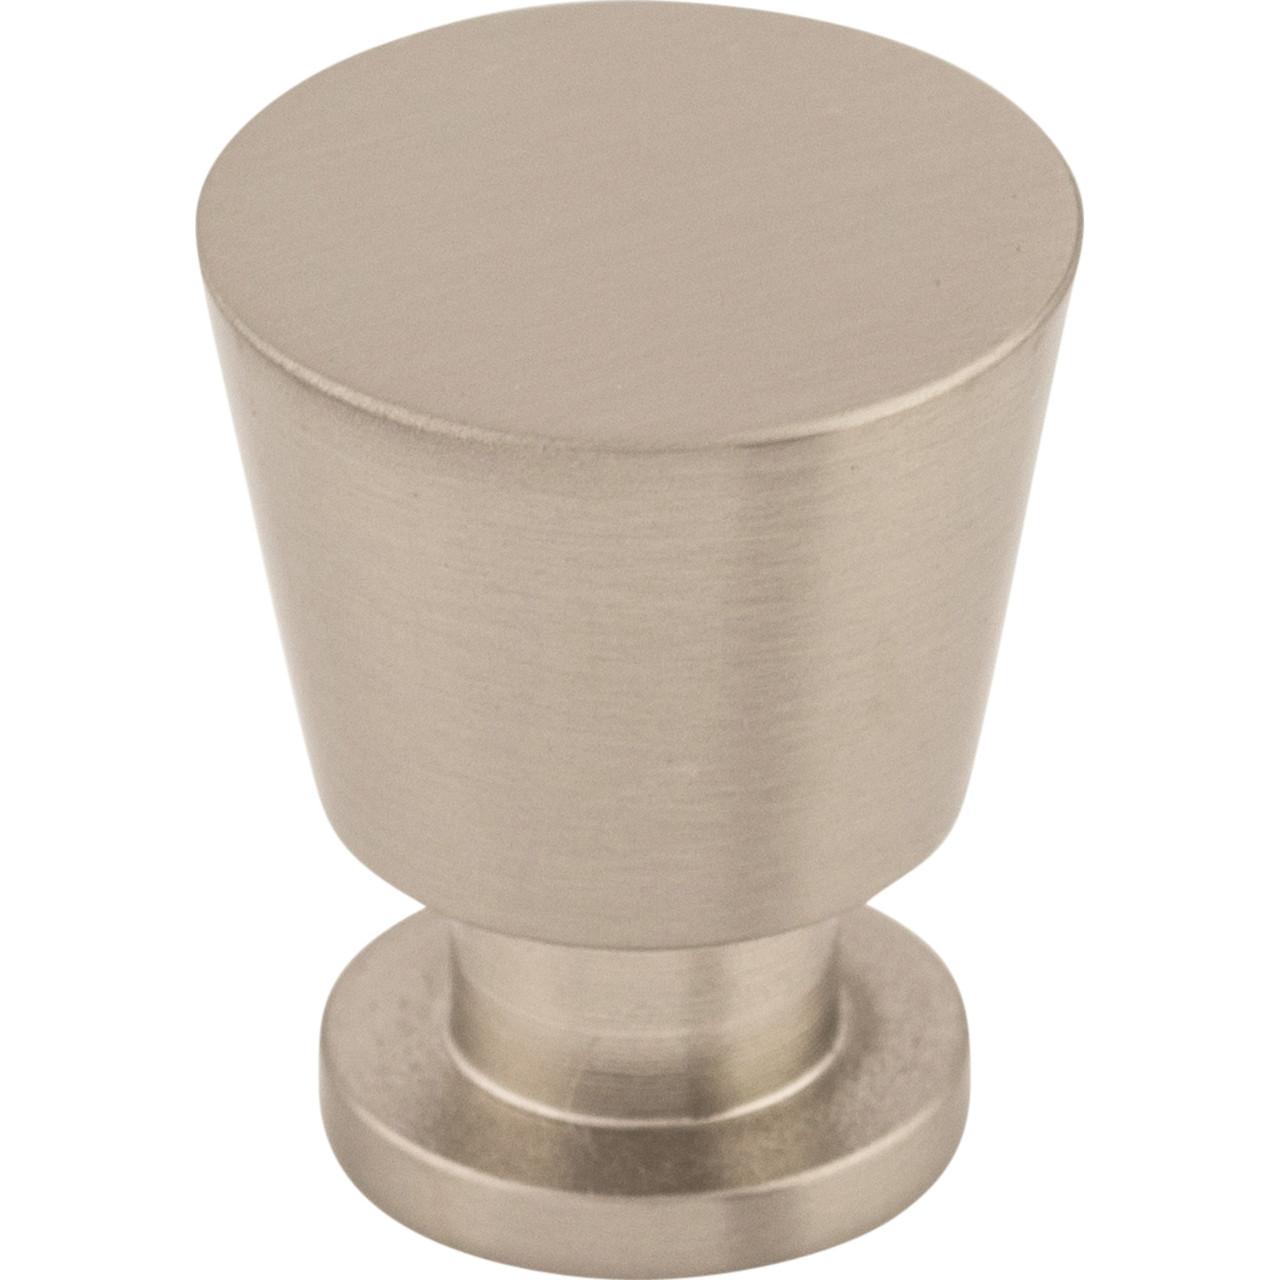 Top Knobs M549 7 8 Rocks Tapered Cabinet Knob Brushed Satin Nickel